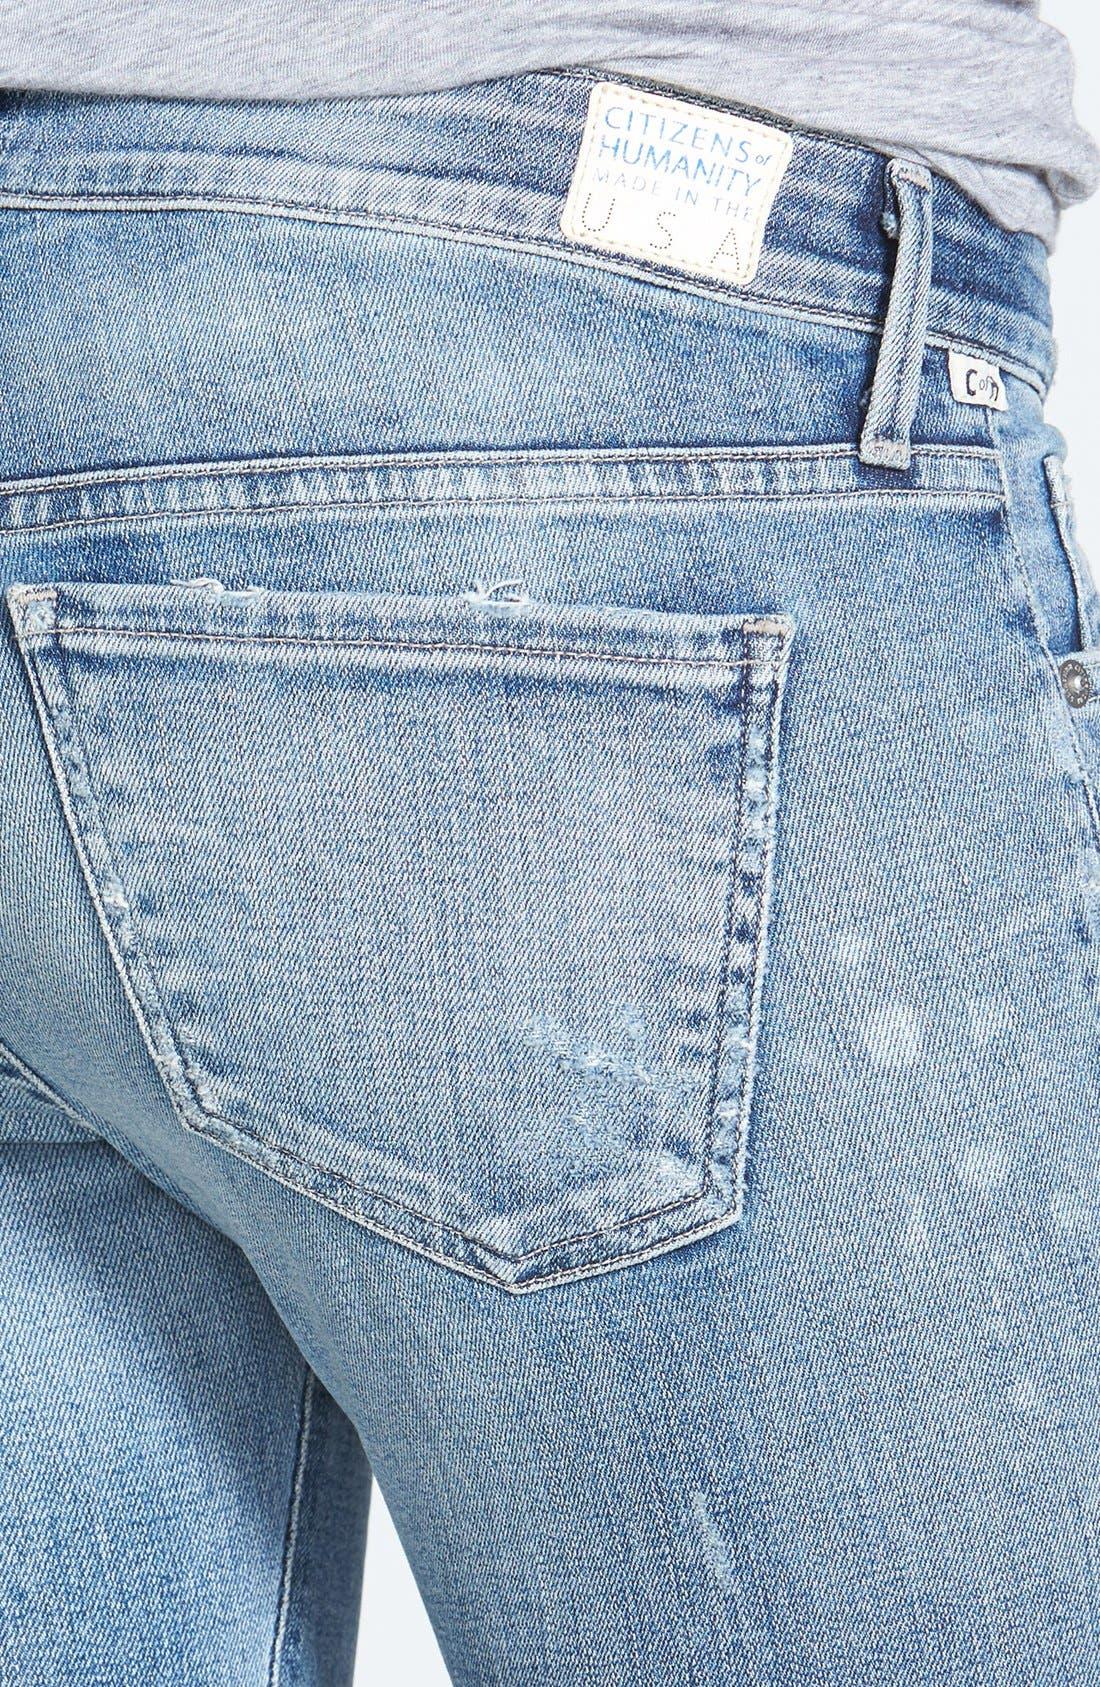 Alternate Image 3  - Citizens of Humanity 'Premium Vintage - Racer' Distressed Skinny Jeans (Crosby)